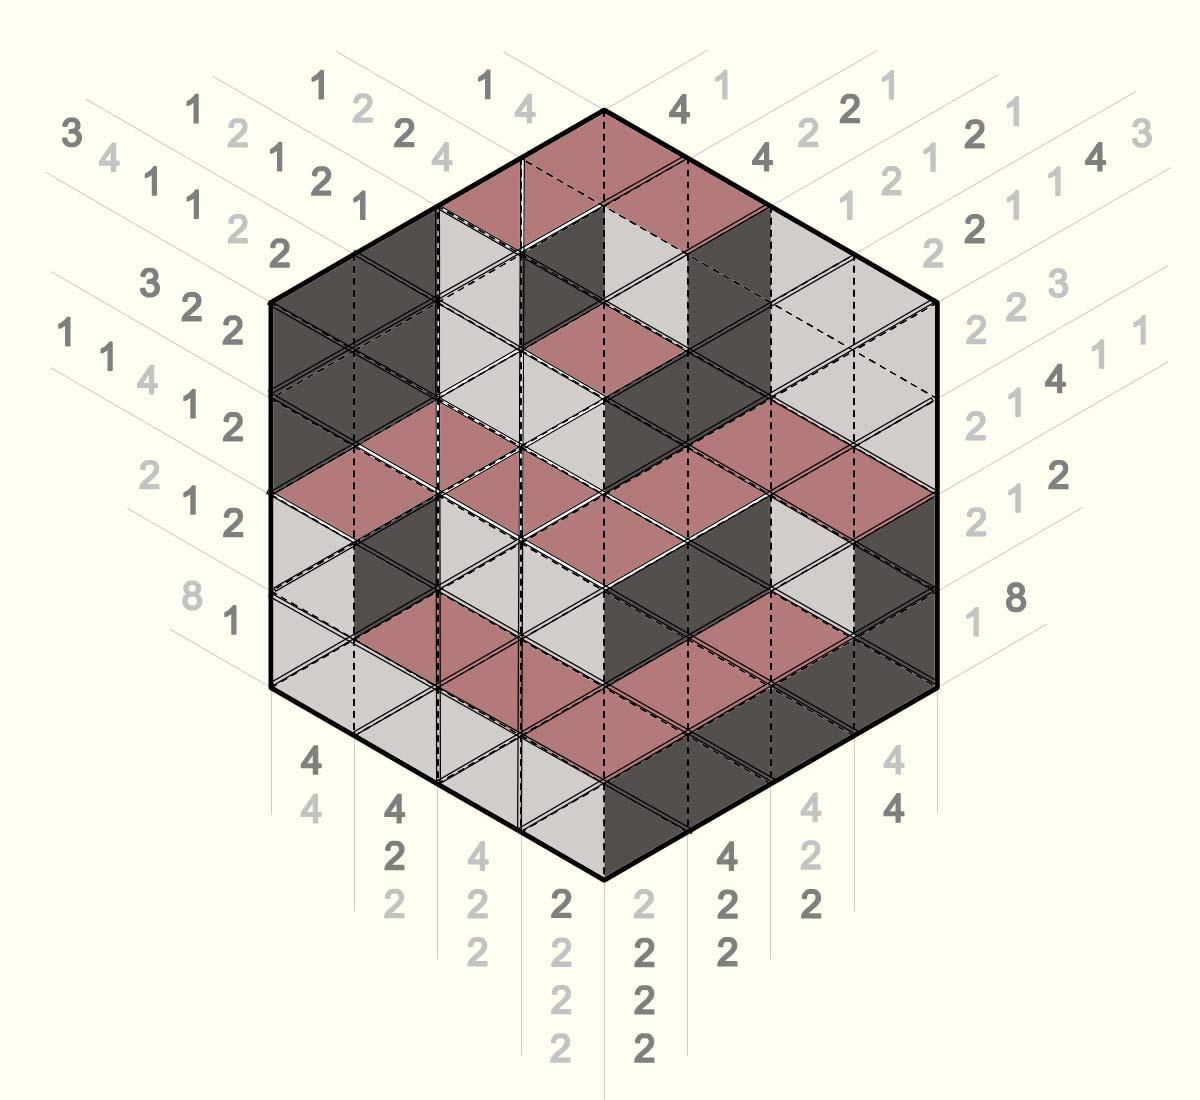 http://www.prise2tete.fr/upload/nobodydy-FRiZMOUT-fre3dom-Etape1jpg.jpg